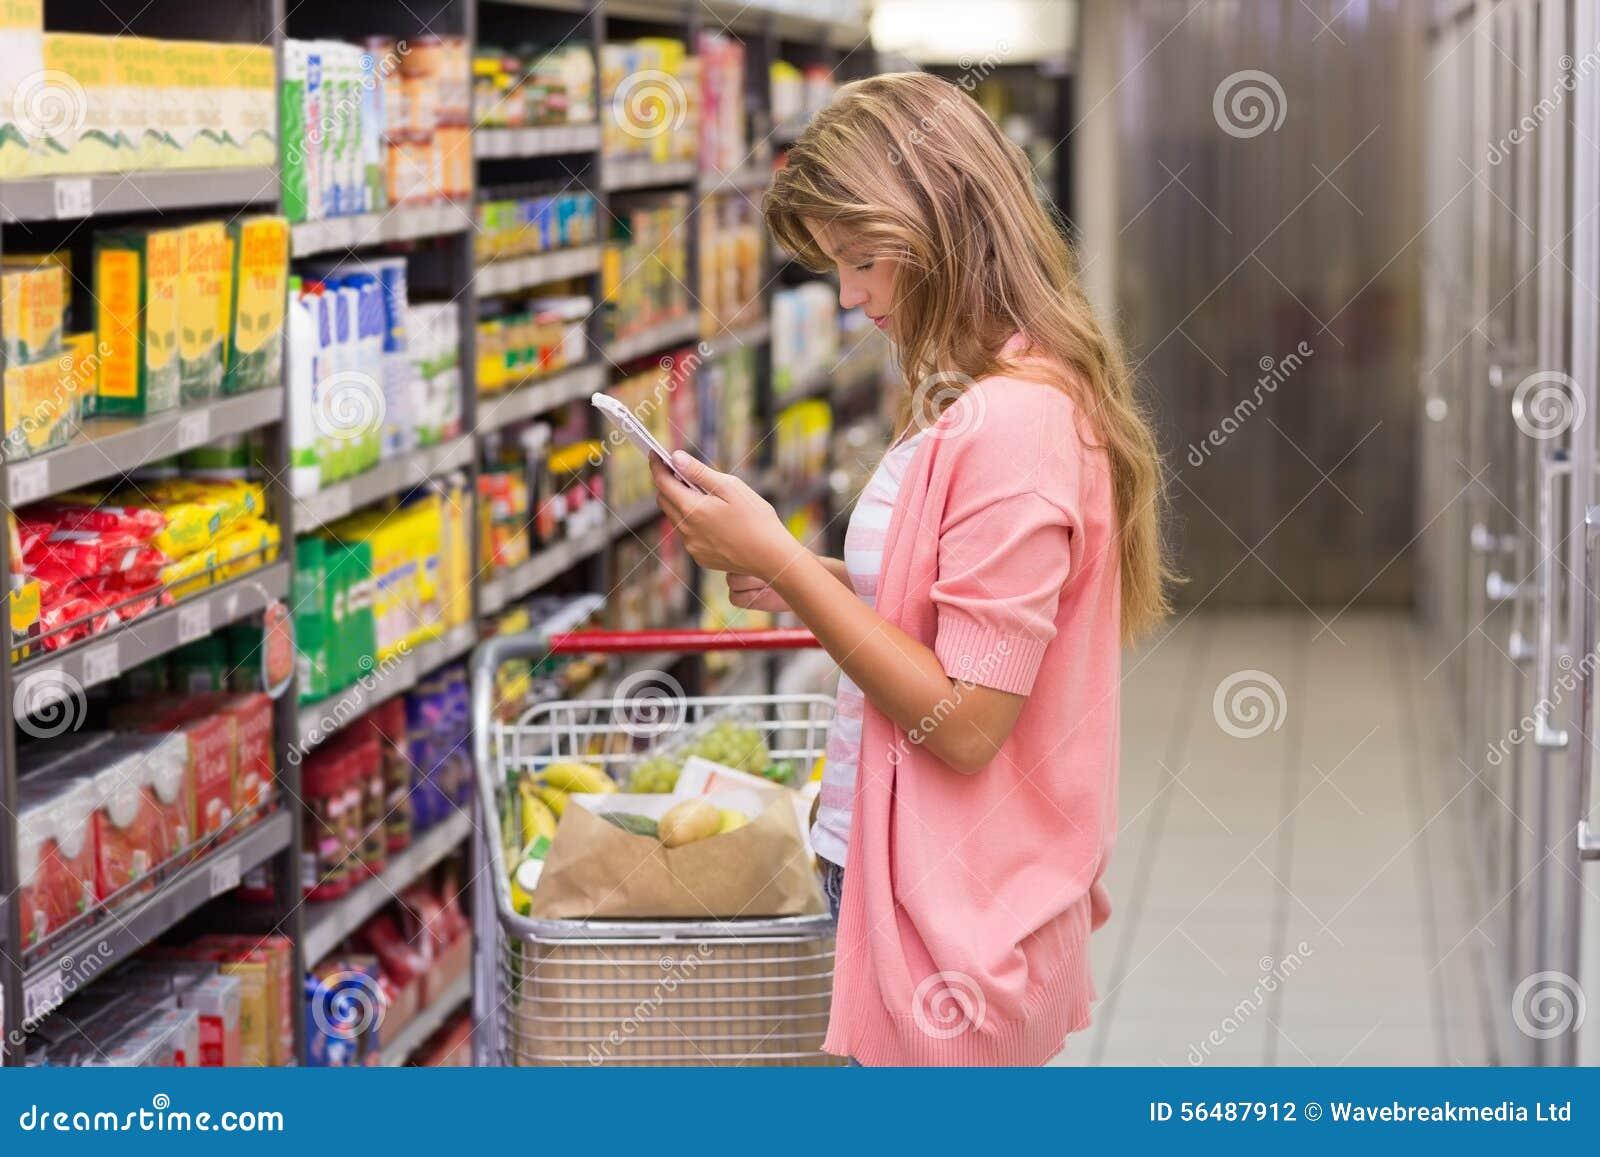 Femme assez blonde regardant un produit